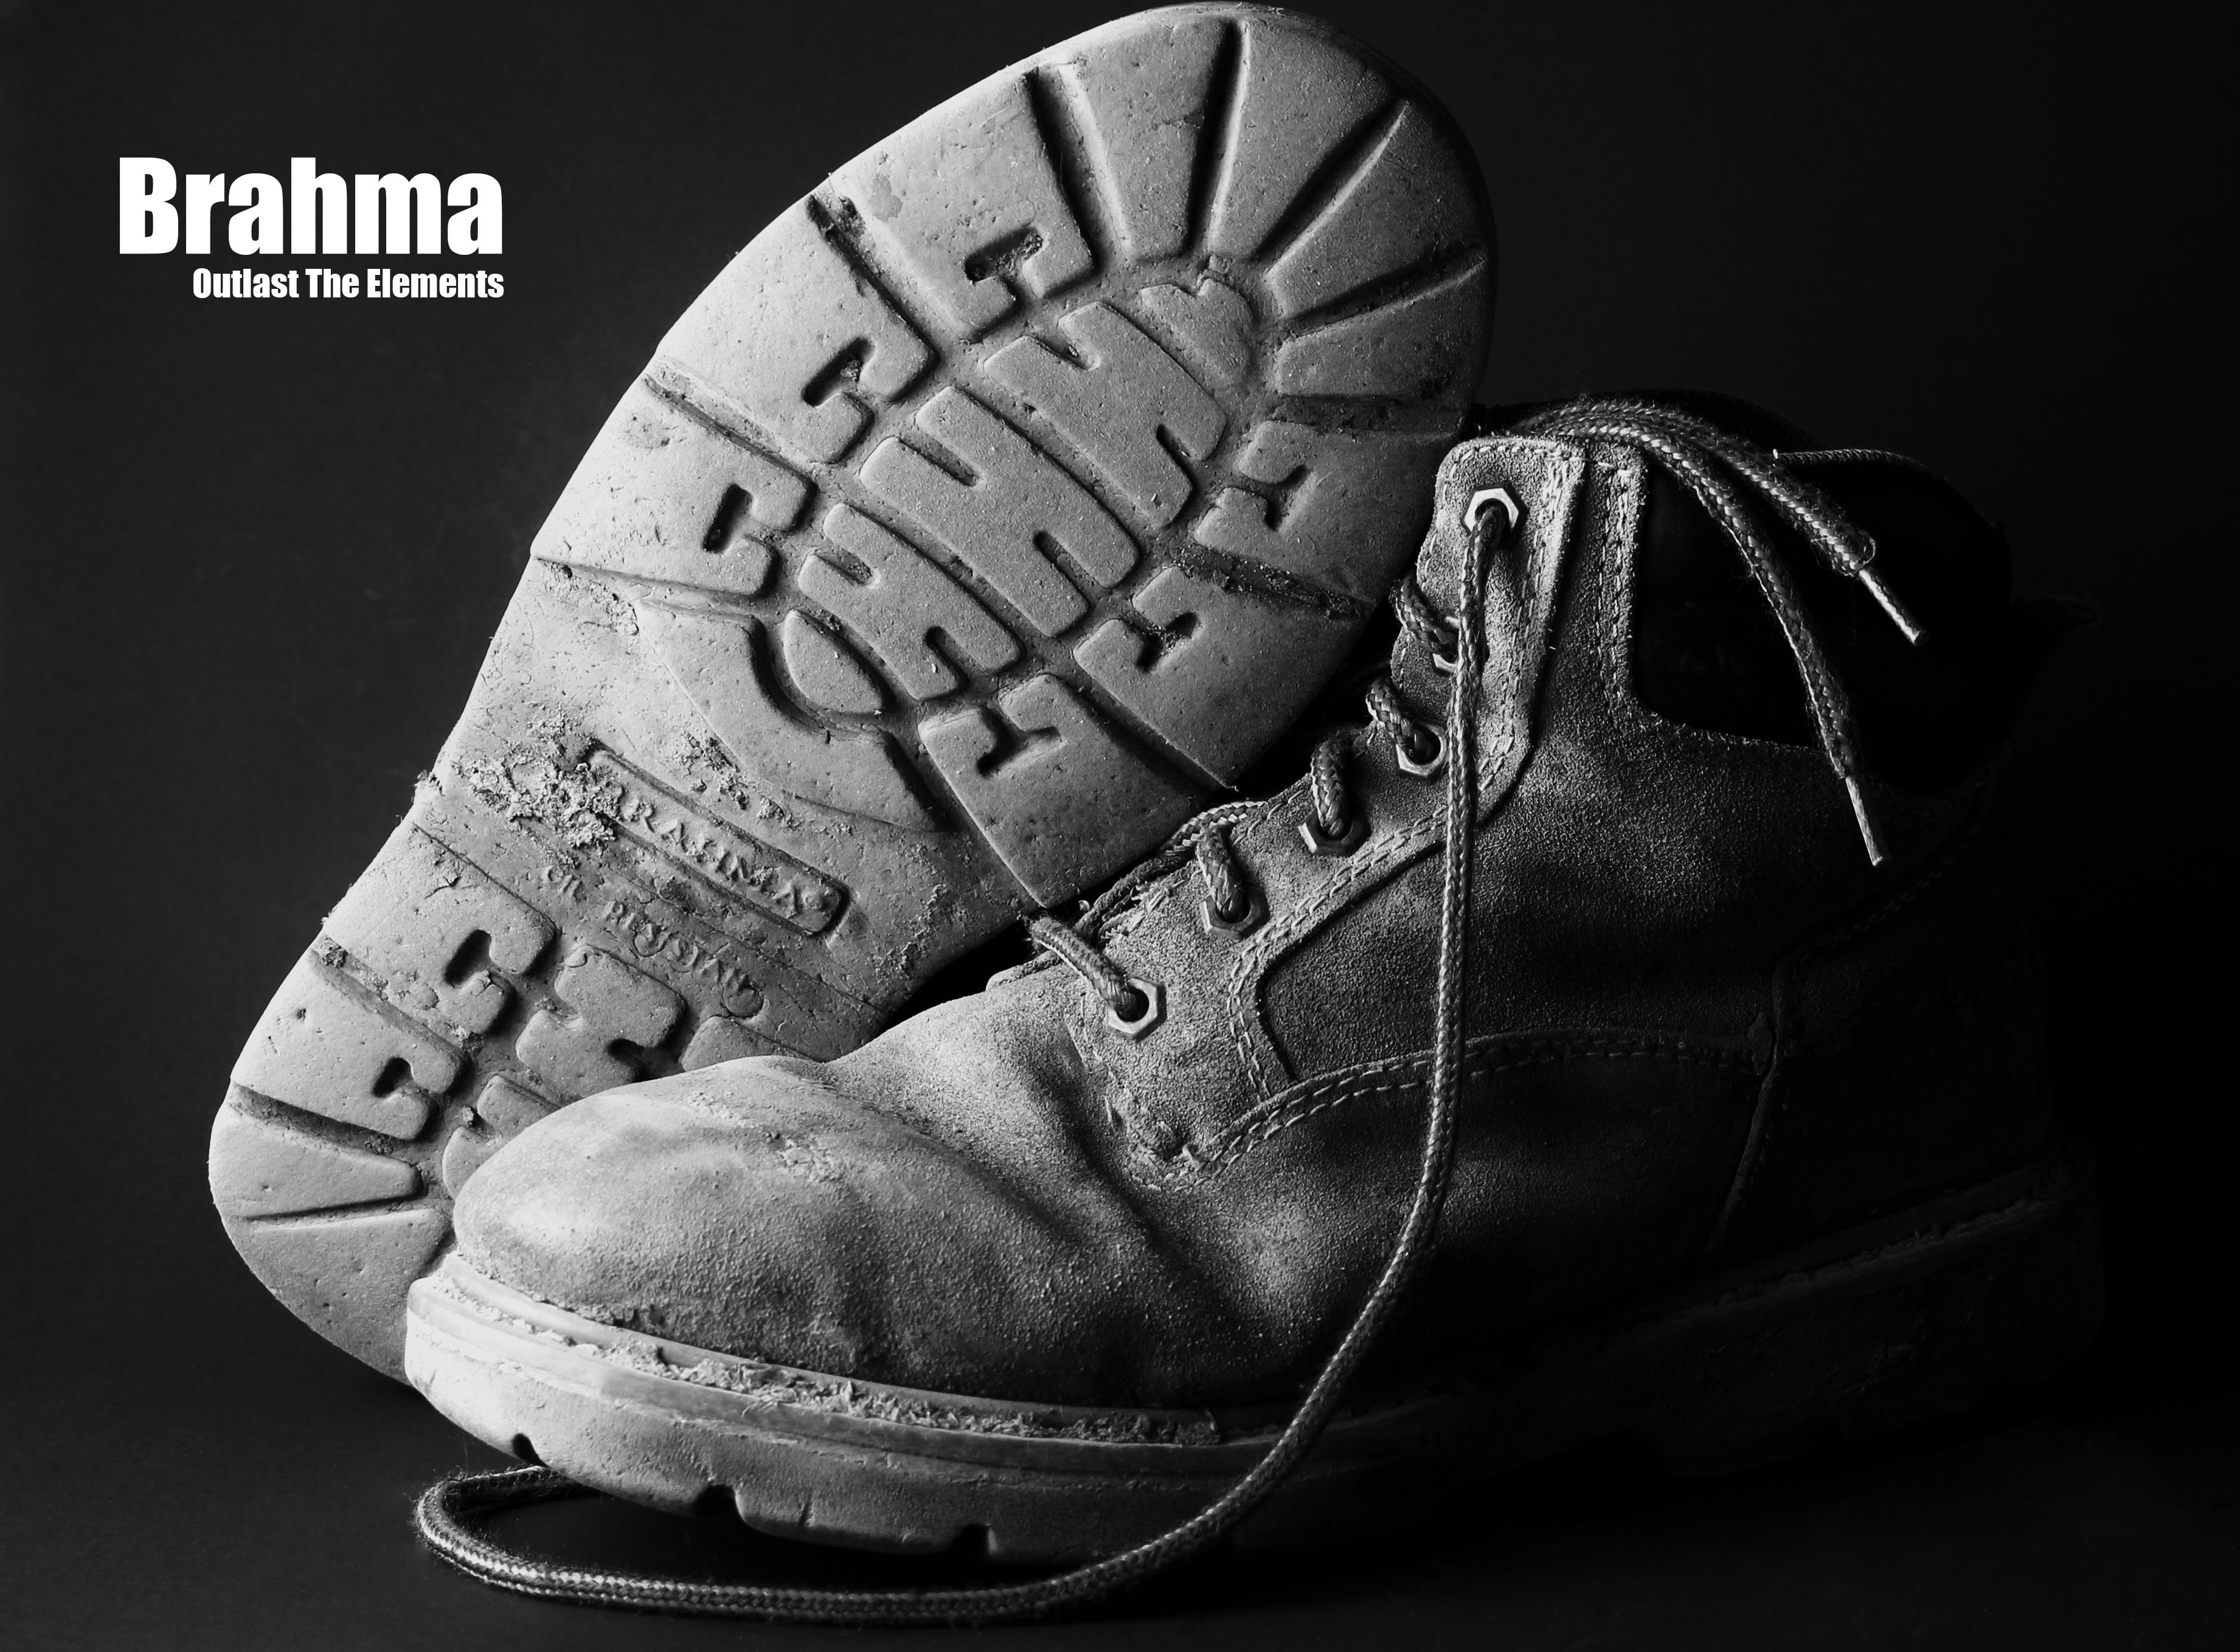 Brahma Boots Ad copy